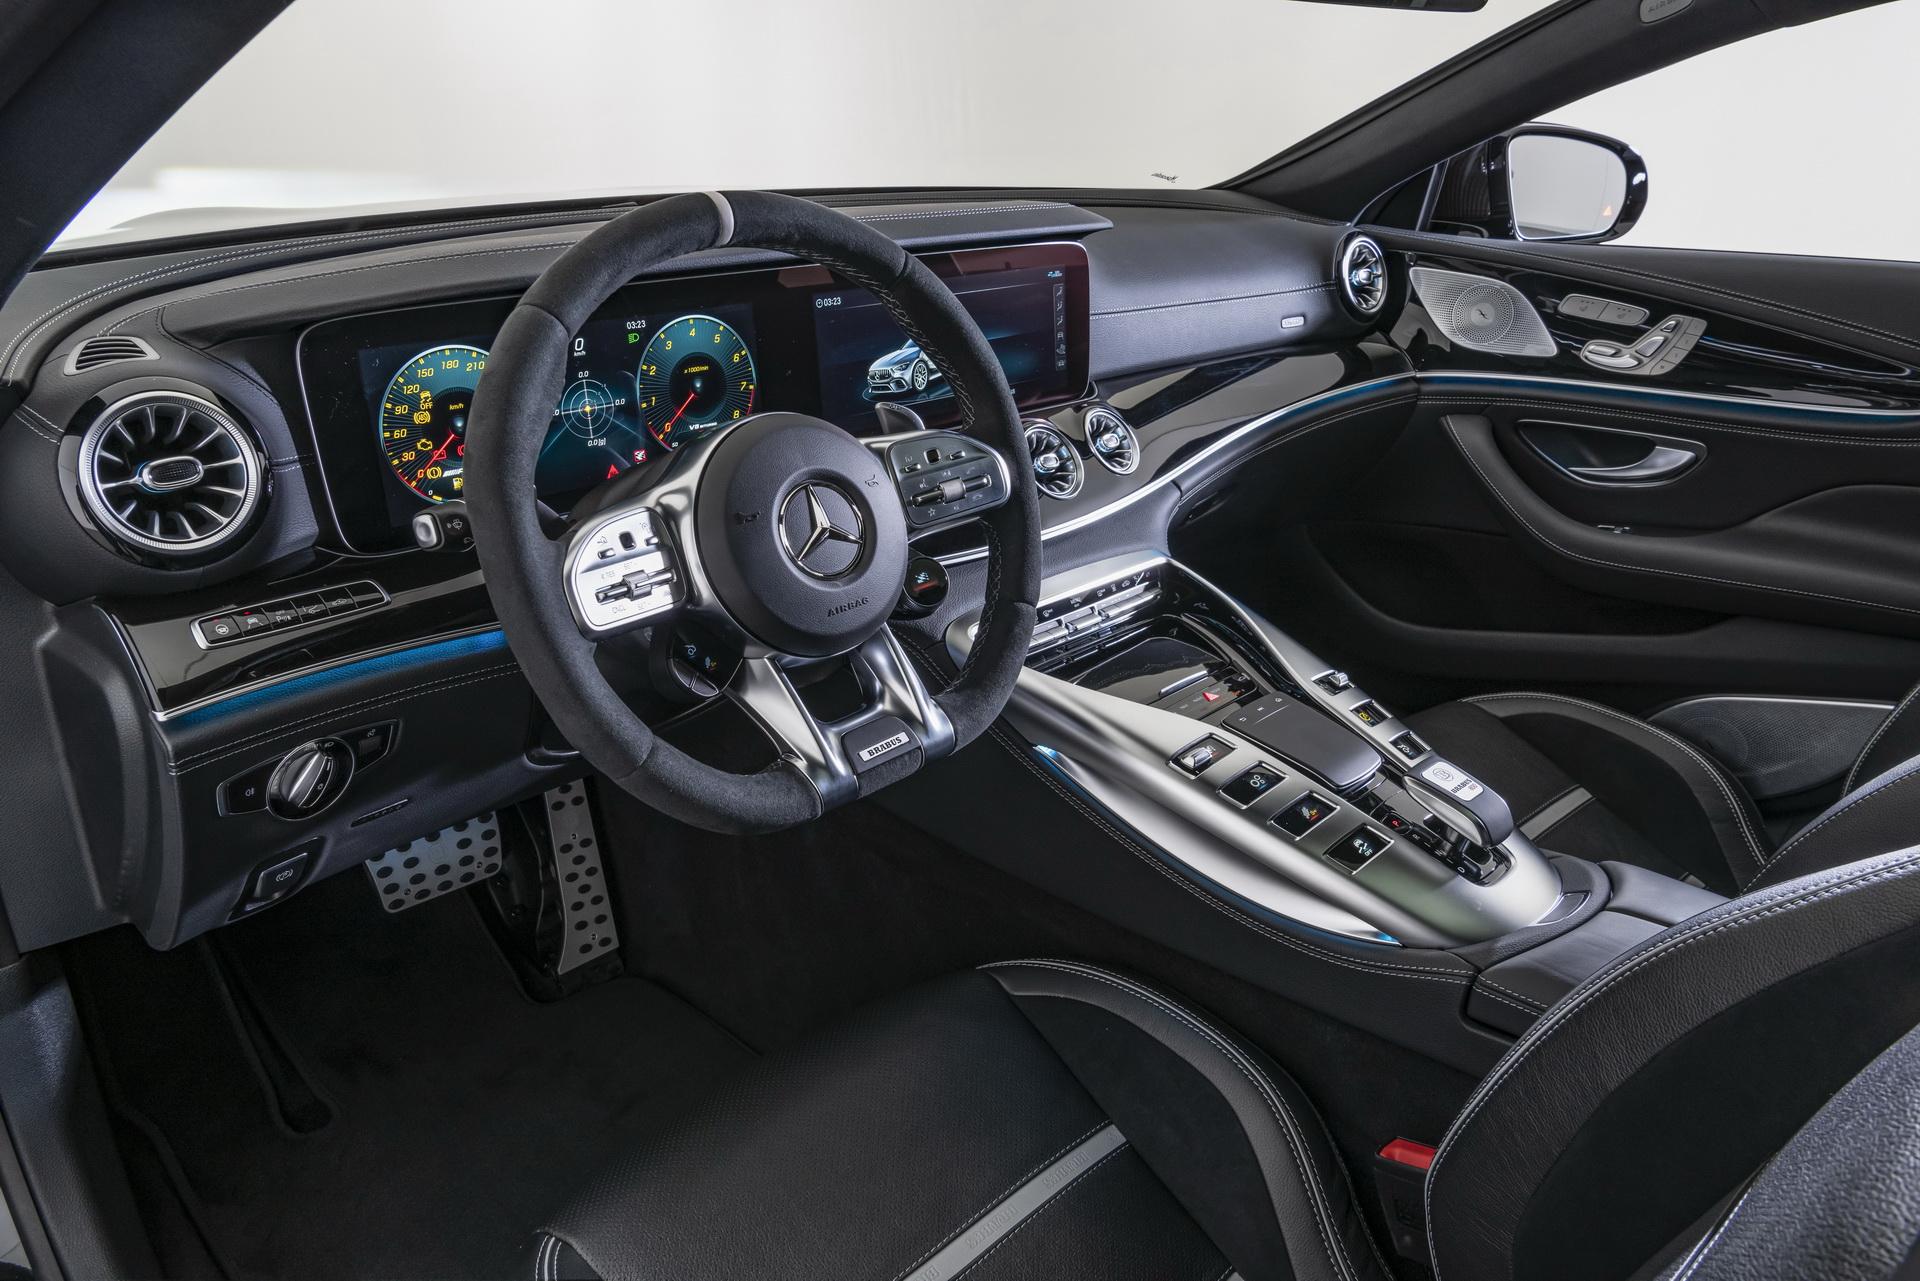 Brabus GT63 S AMG Interior